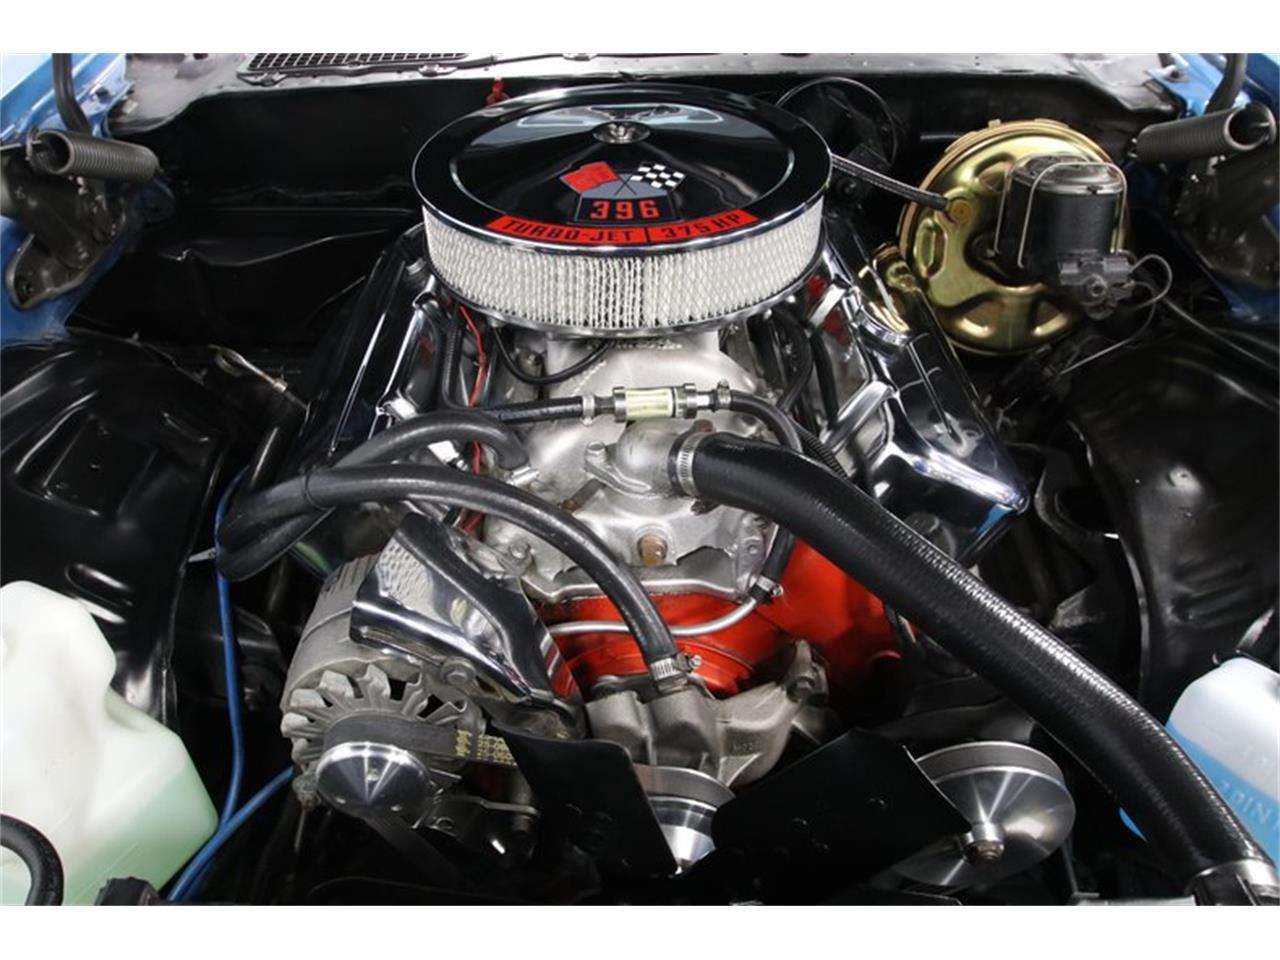 Large Picture of Classic 1970 Chevrolet Camaro located in North Carolina - $36,995.00 - QRKC